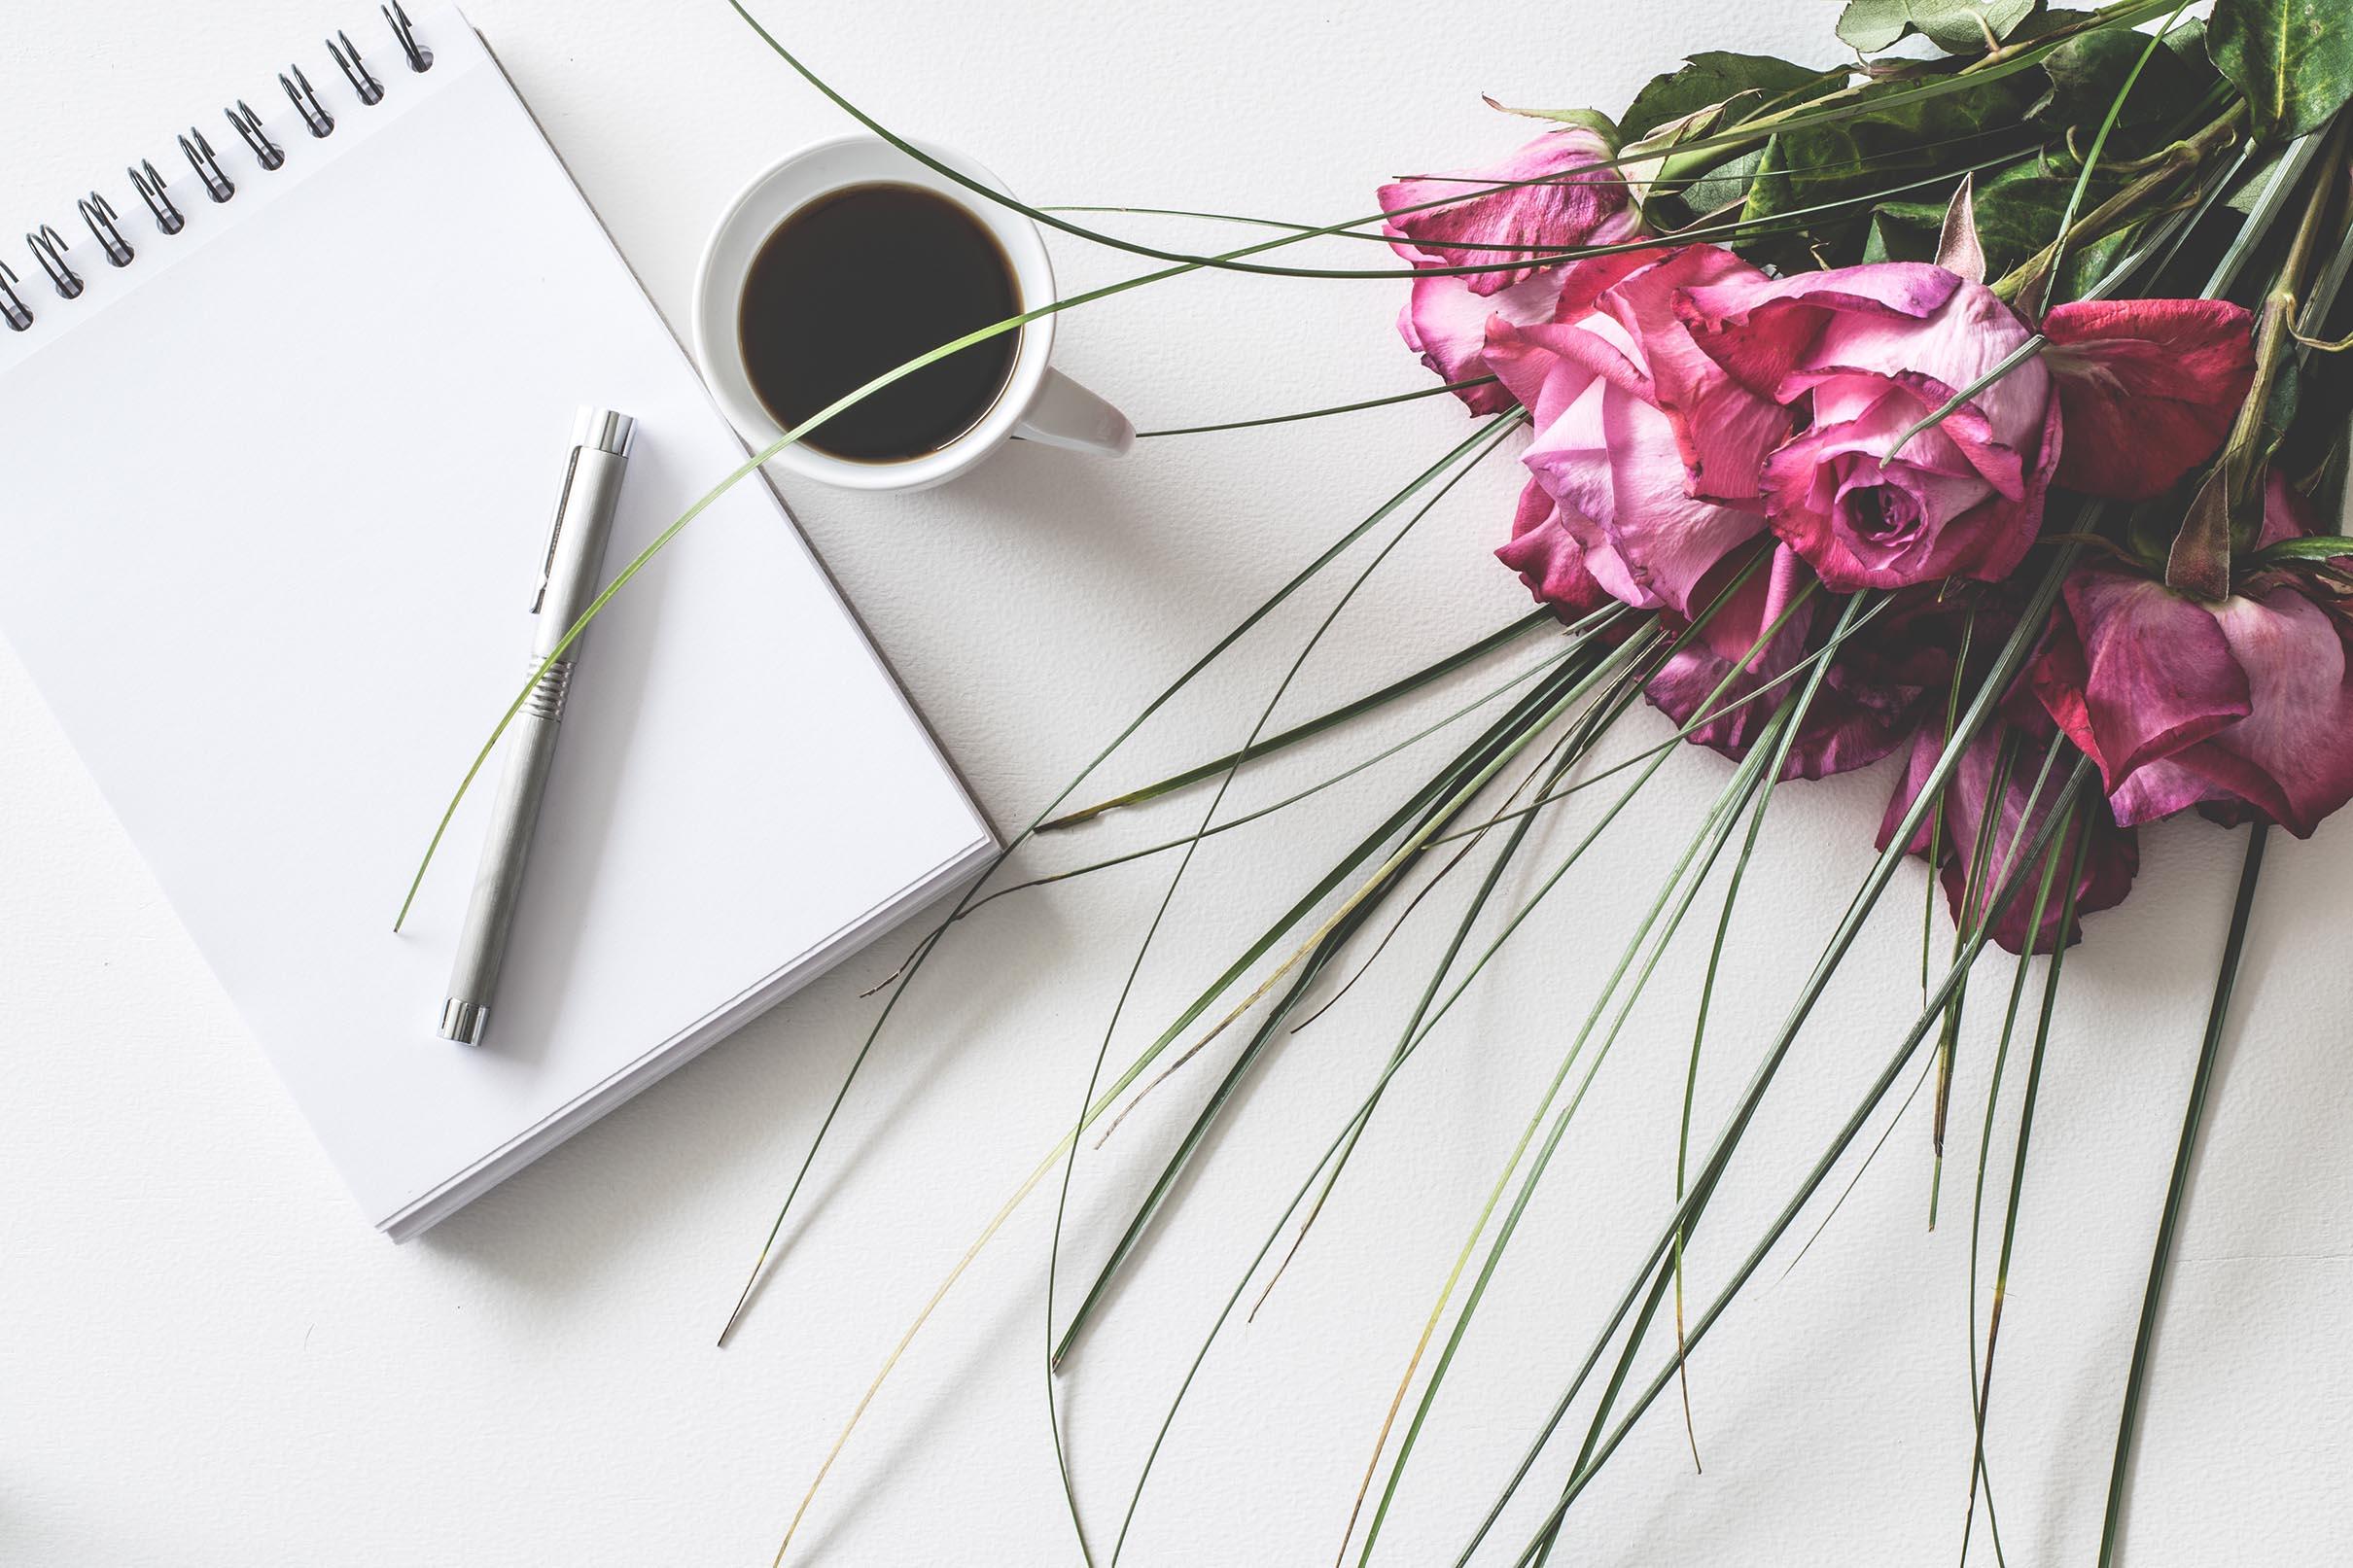 Planning your wedding - wedding planning